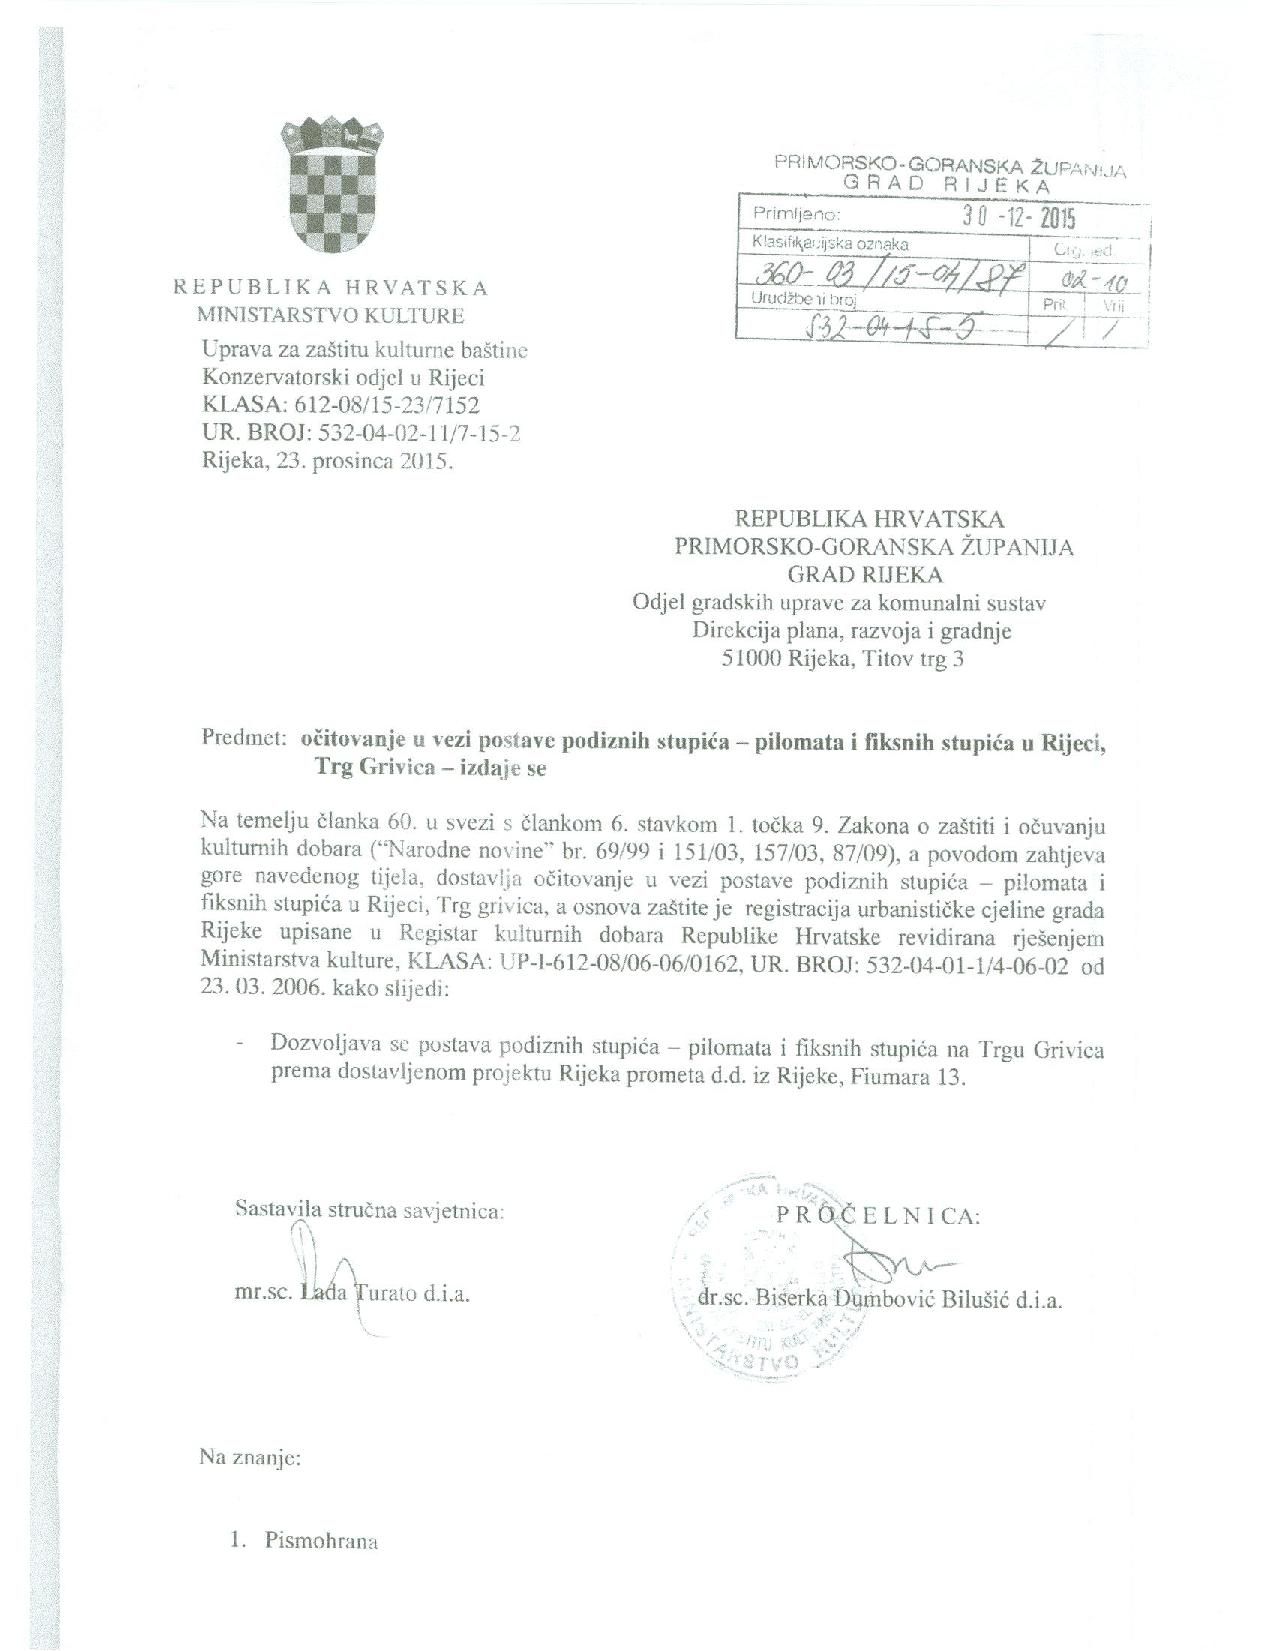 Konz-odjel-odobrenje